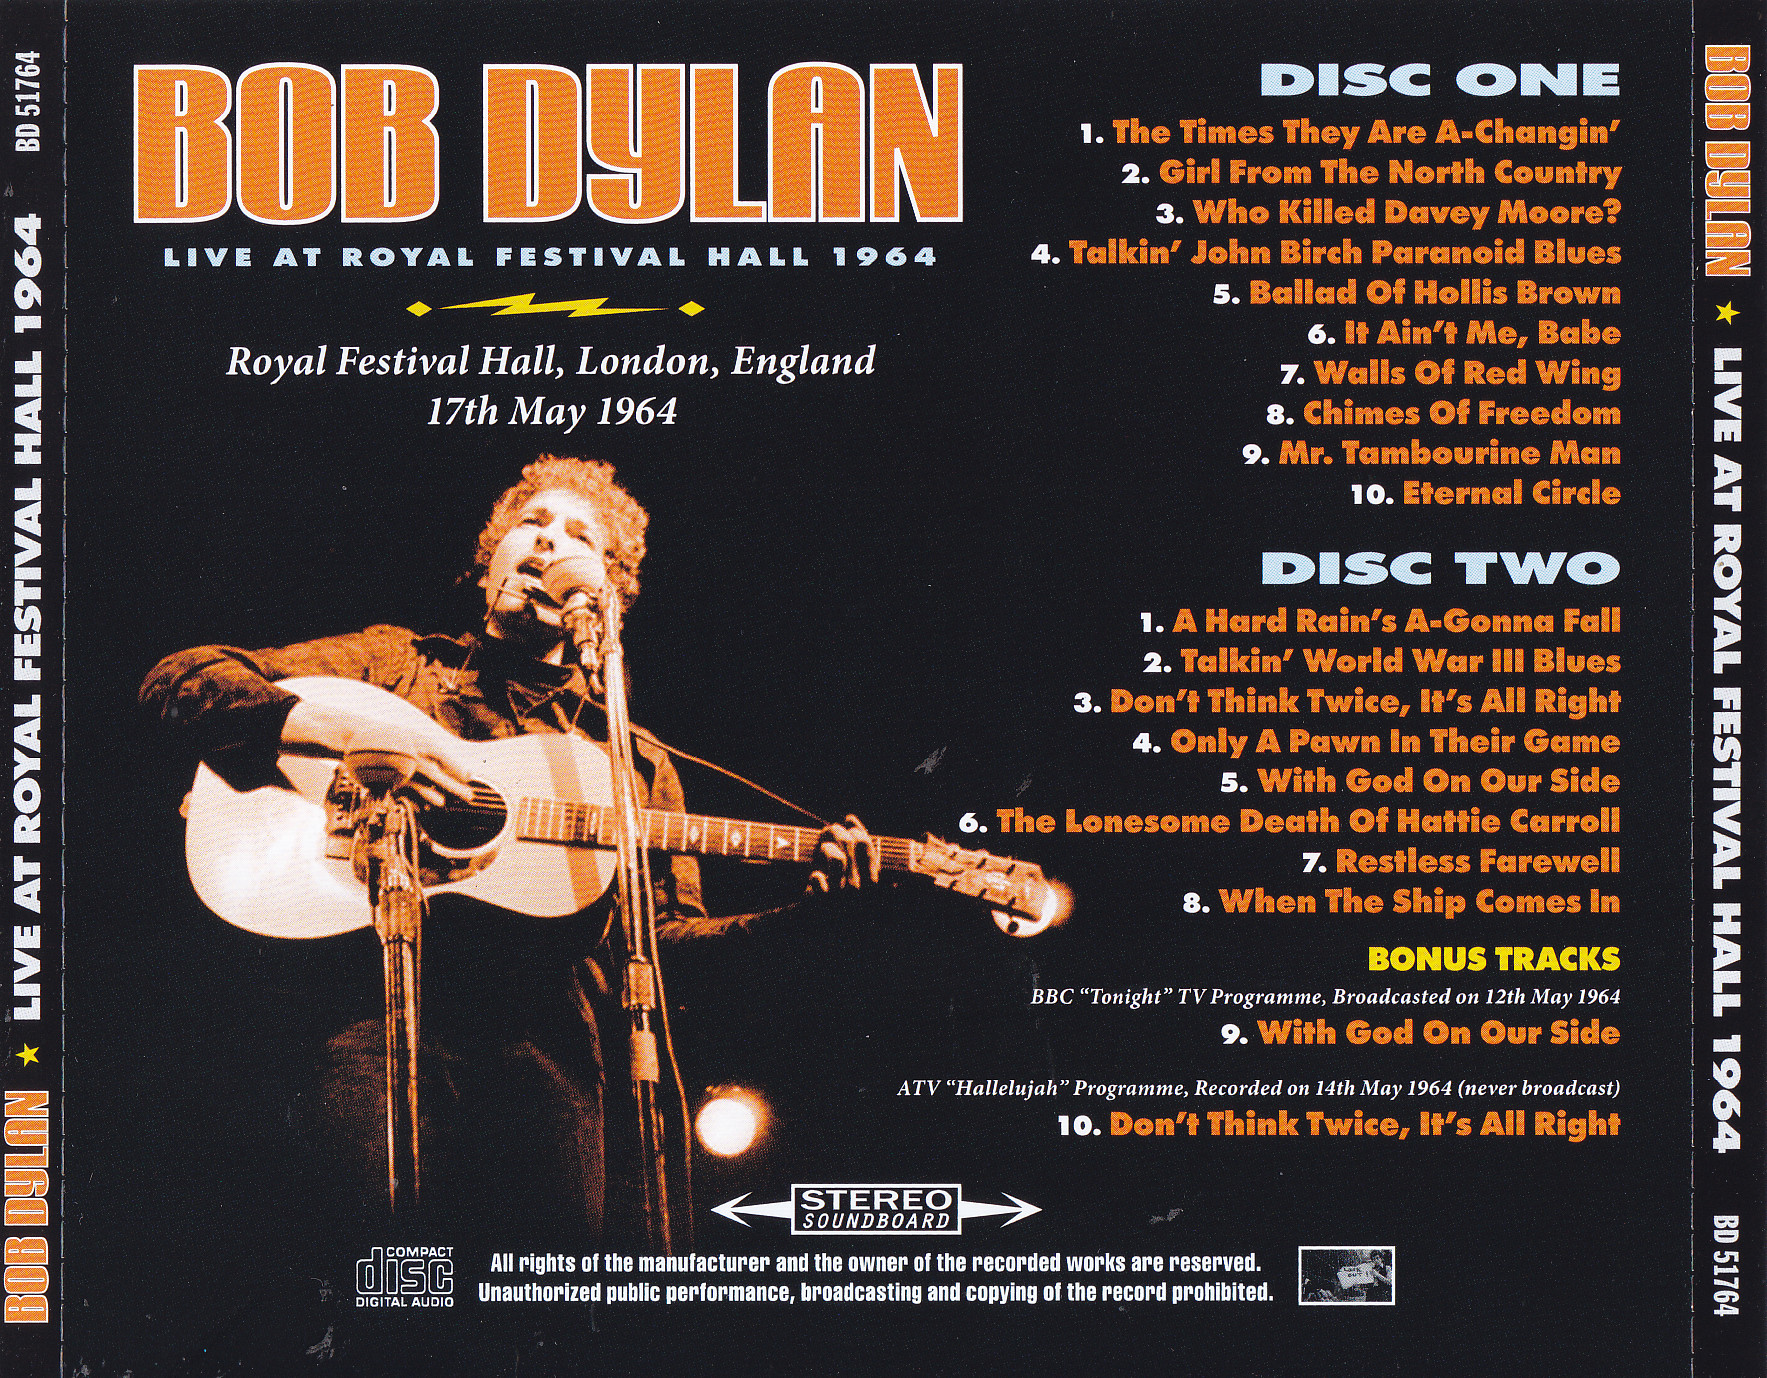 Bob Dylan - Live At Royal Festival Hall 1964 (2CD) BD-51764